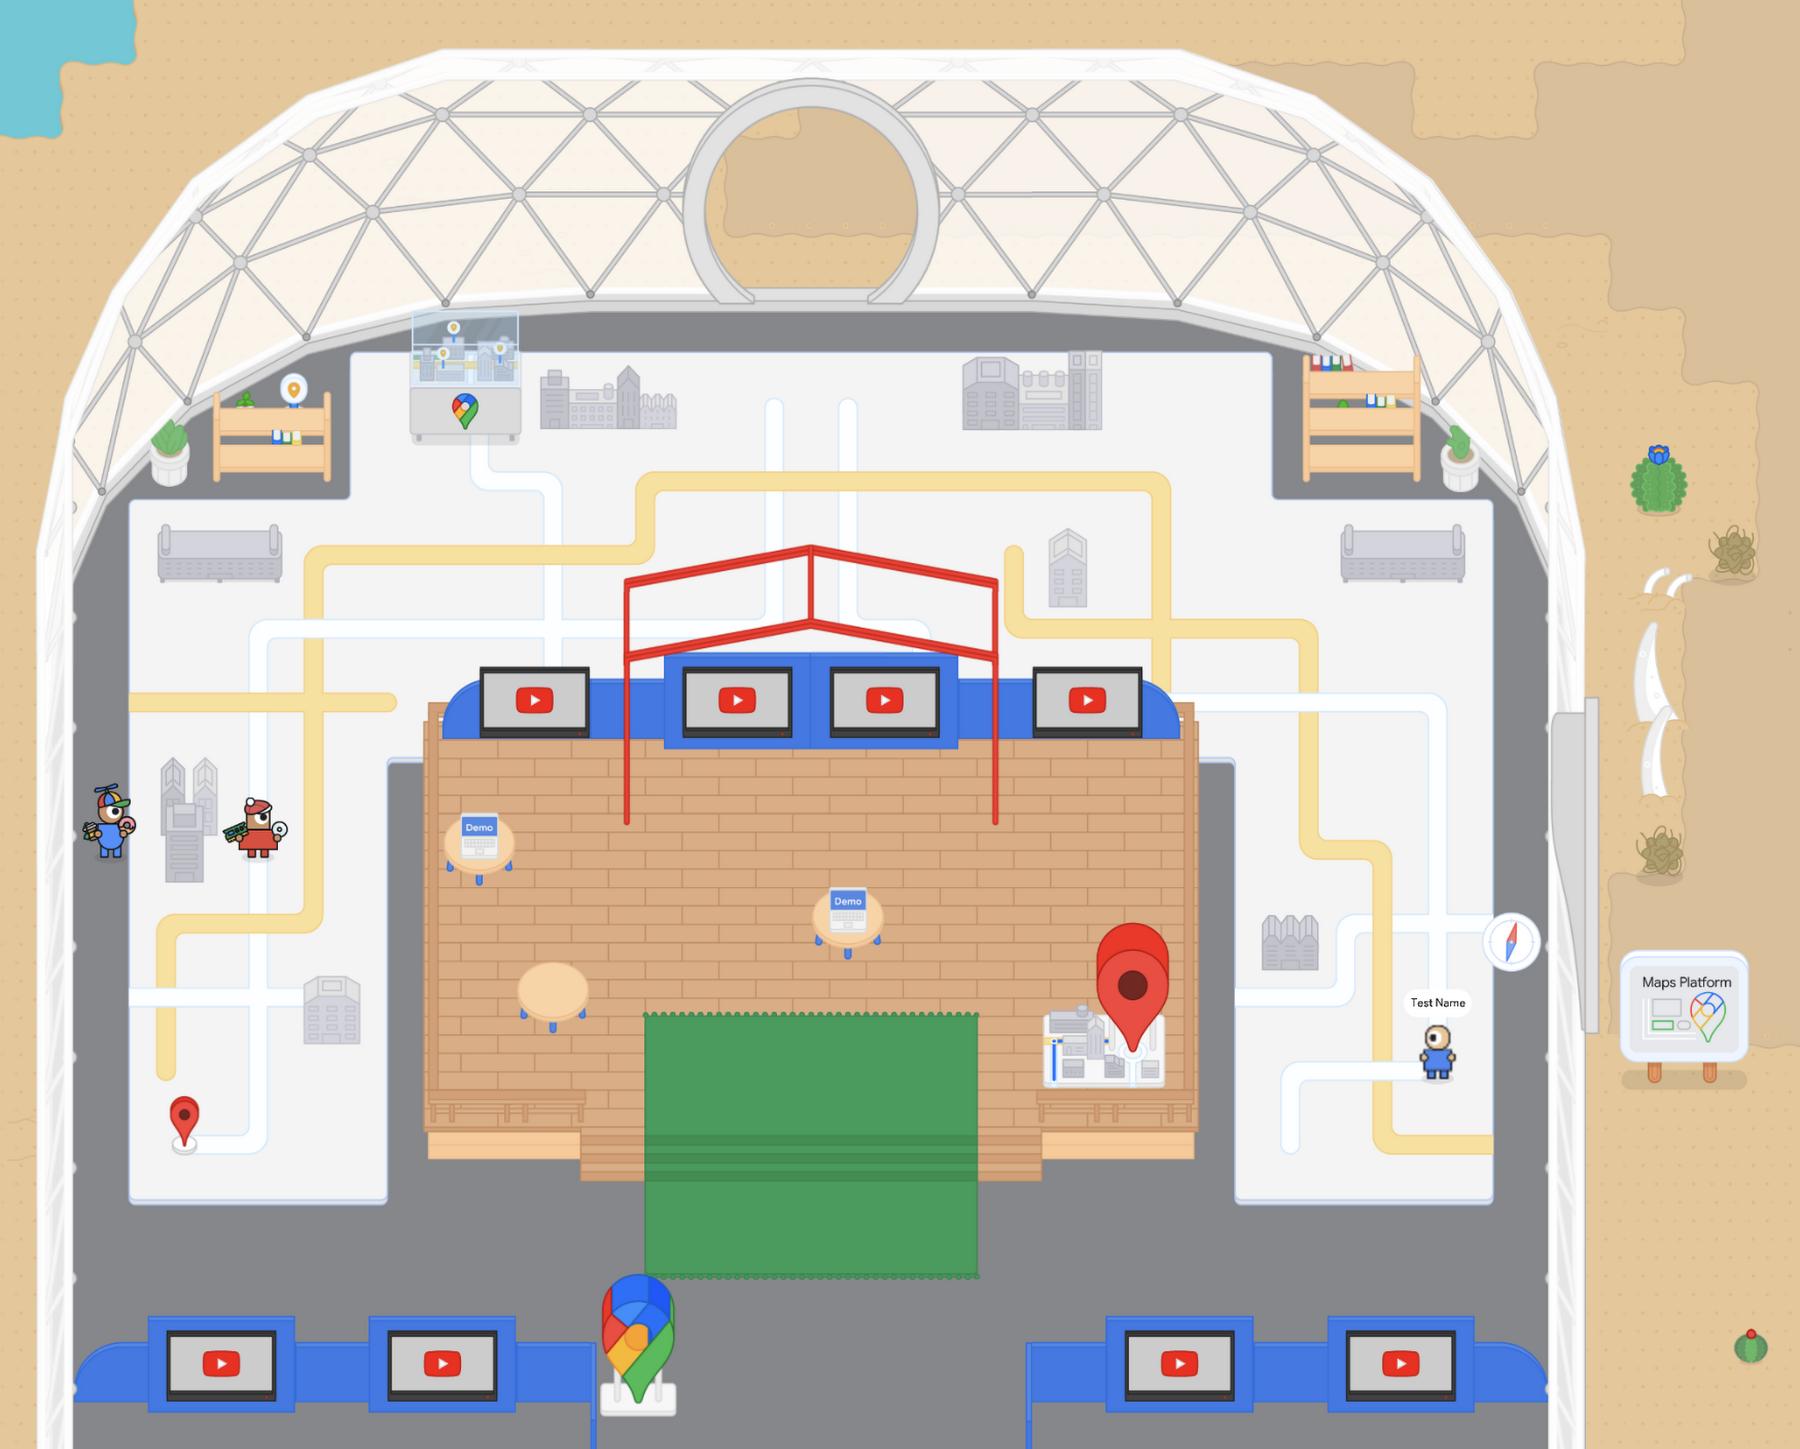 Google Maps Platform dome